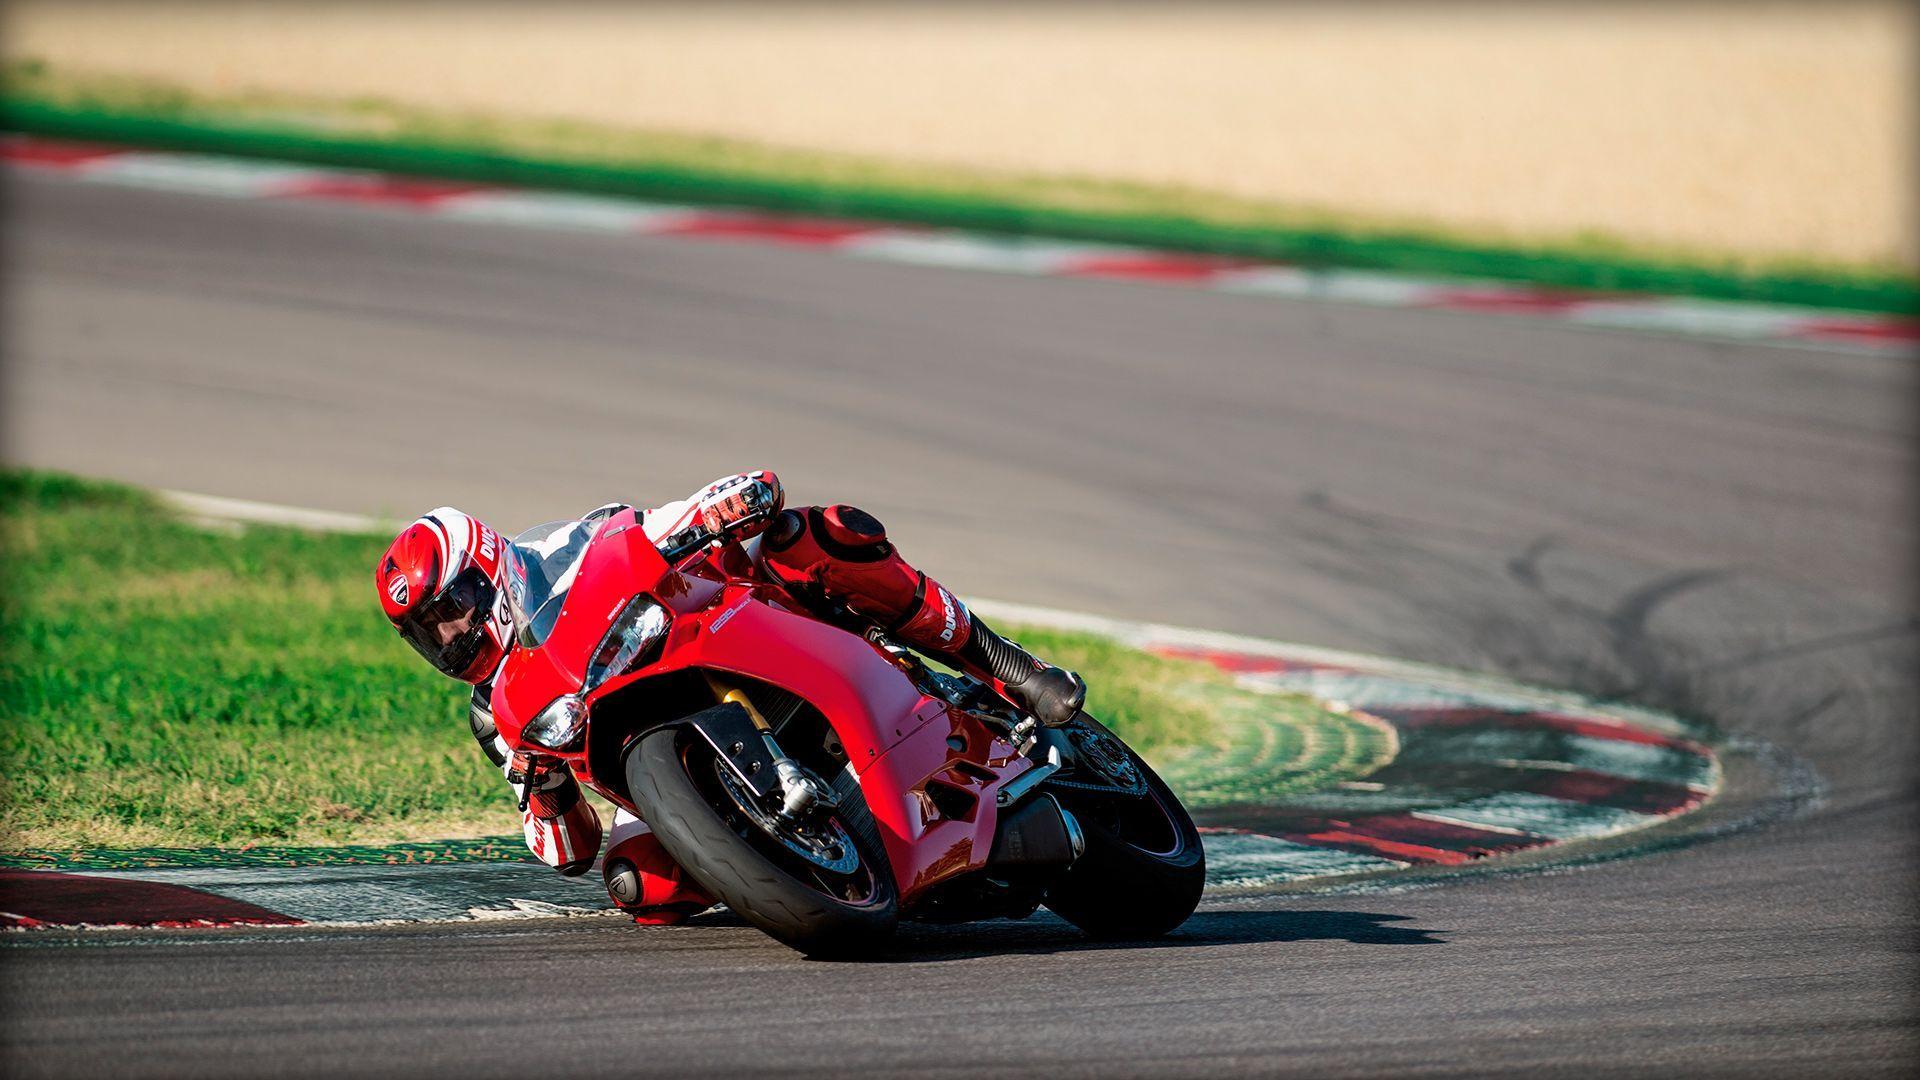 2015 Ducati 1299 Panigale S | 1299 Panigale S - Apex